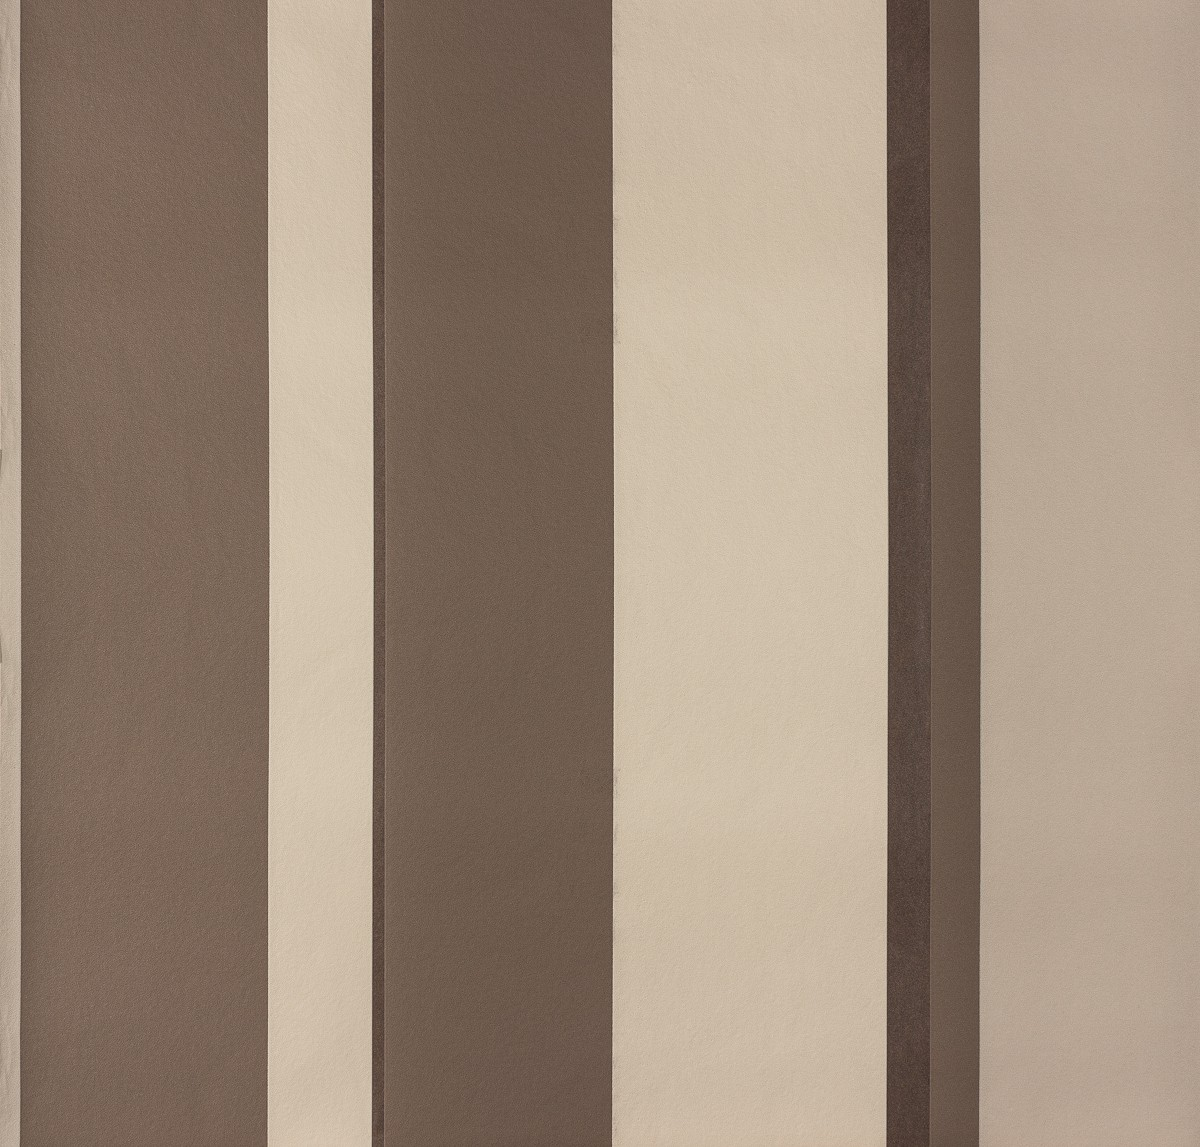 Wallpaper brown stripes raffi 2 94018 3 for Tapete streifen beige